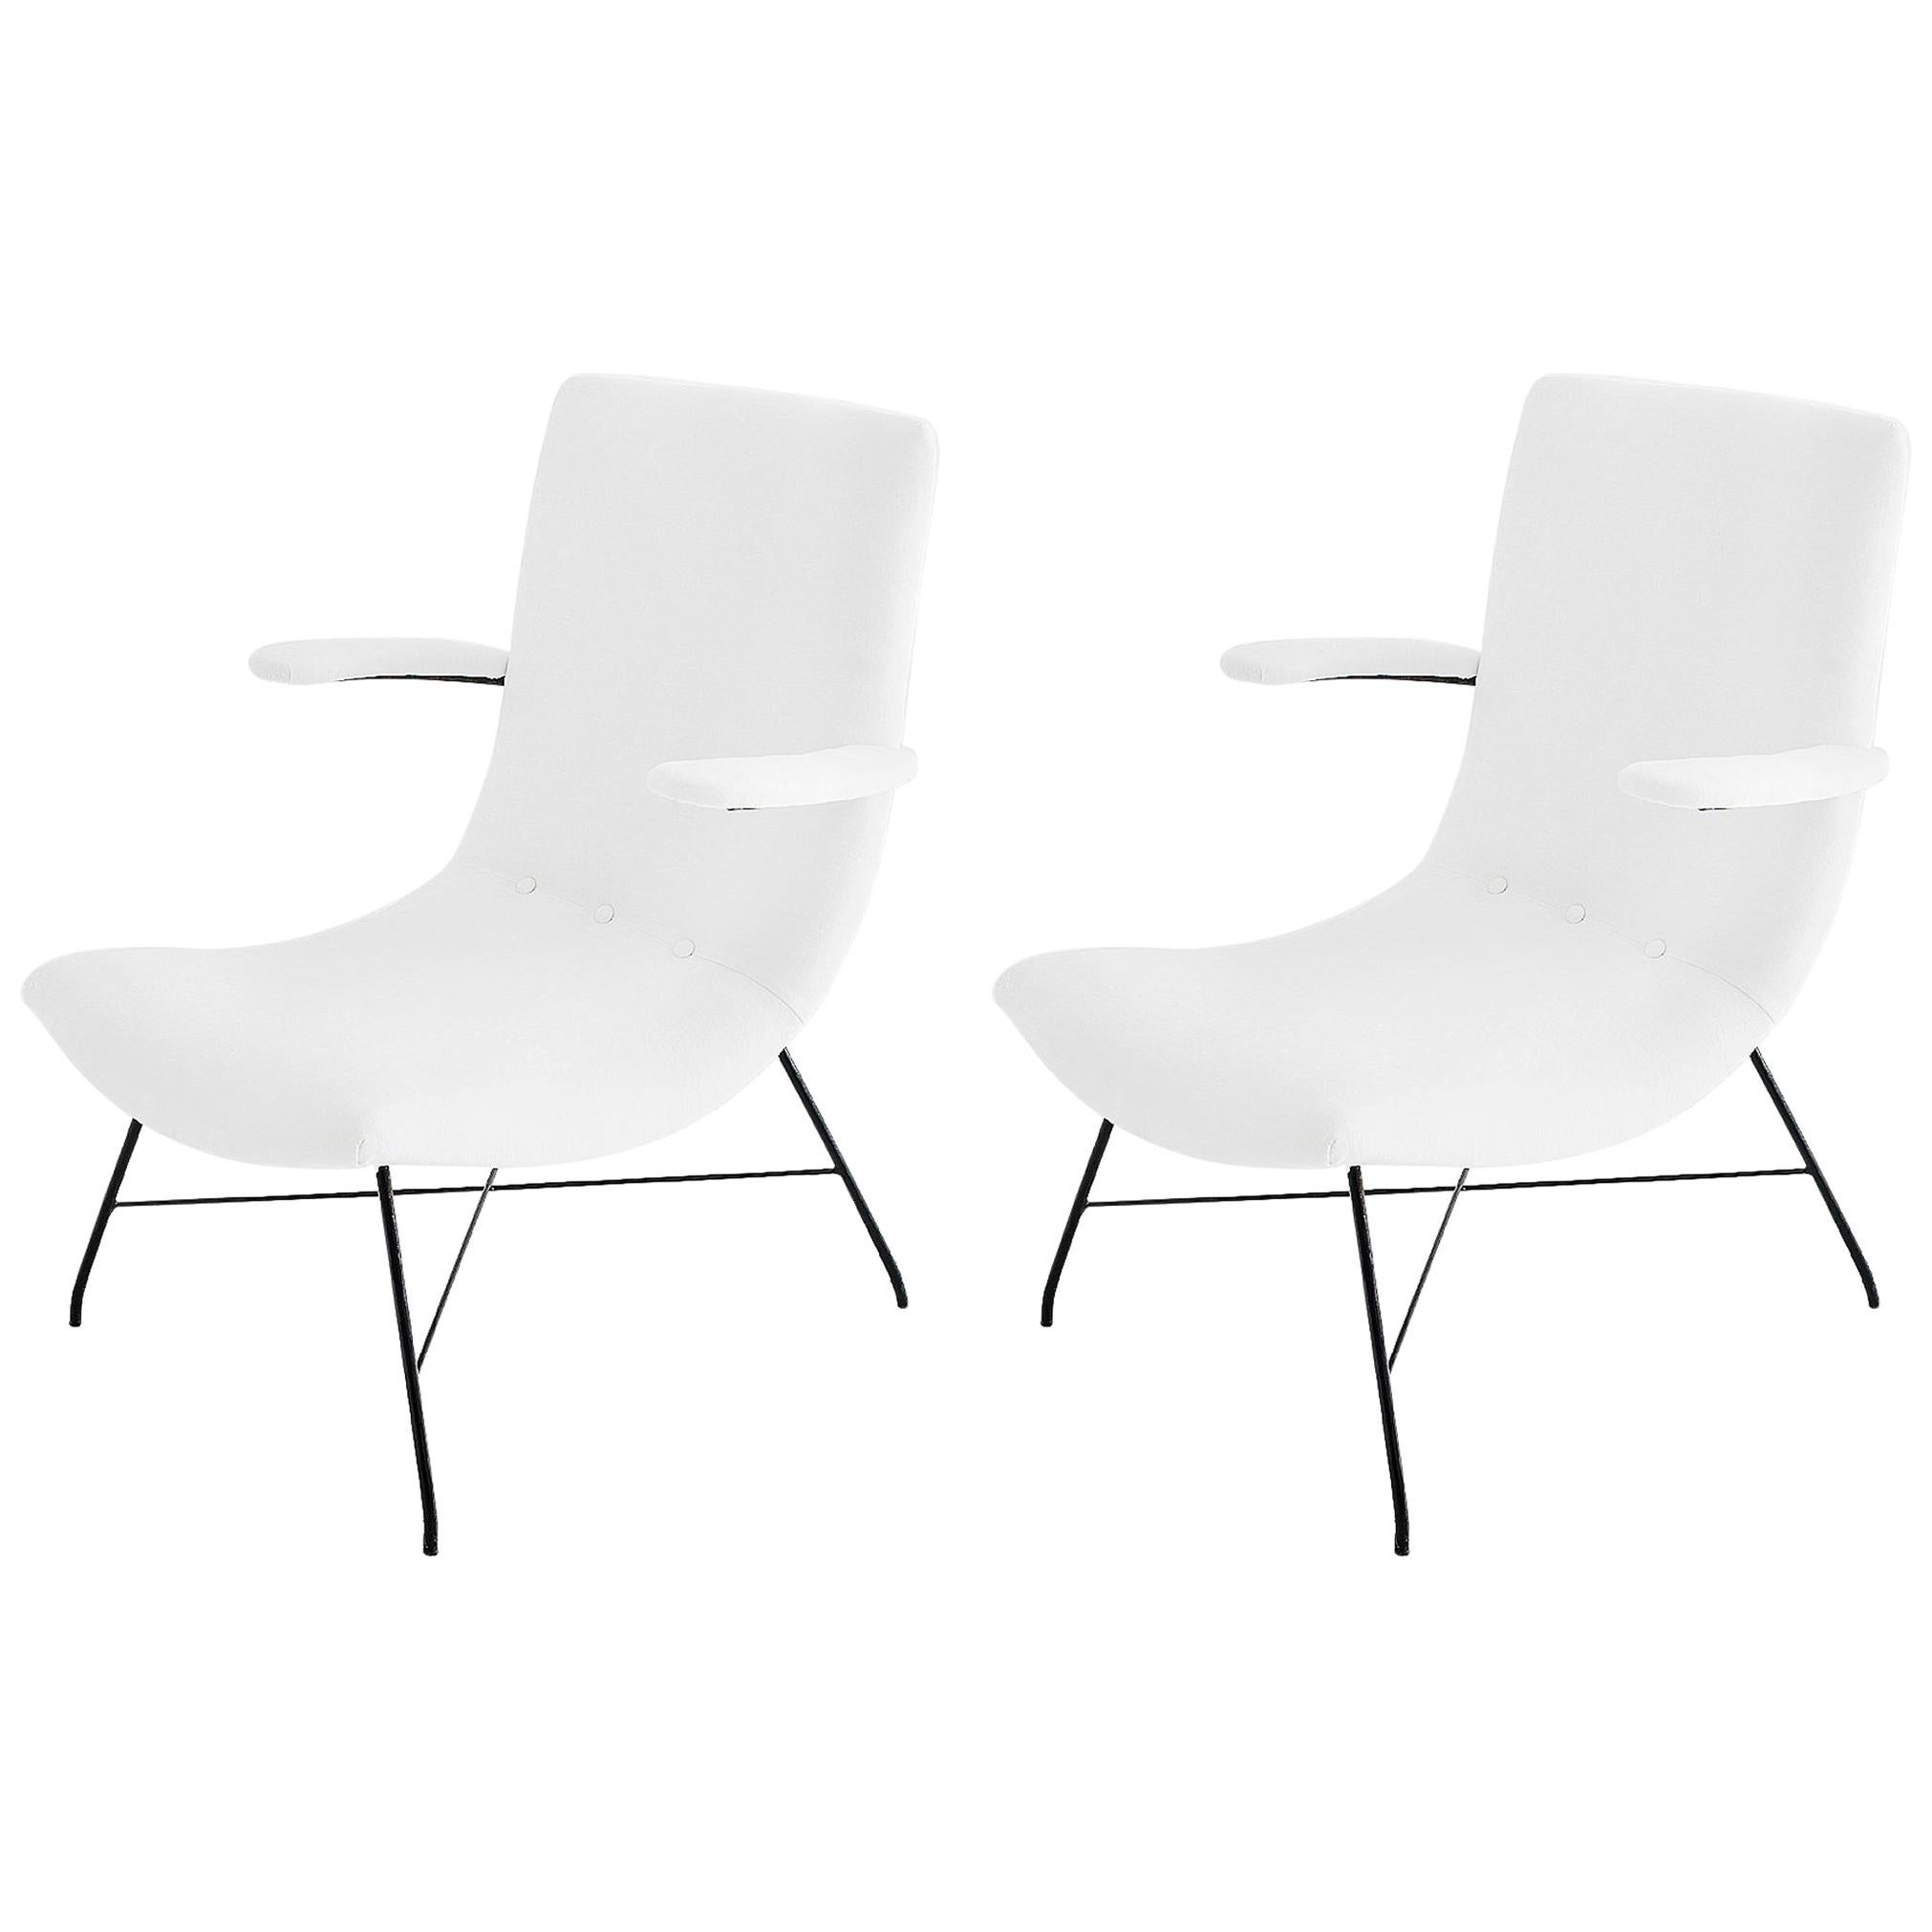 Martin Eisler & Carlo Hauner Pair of Midcentury Brazilian White Lounge Chairs